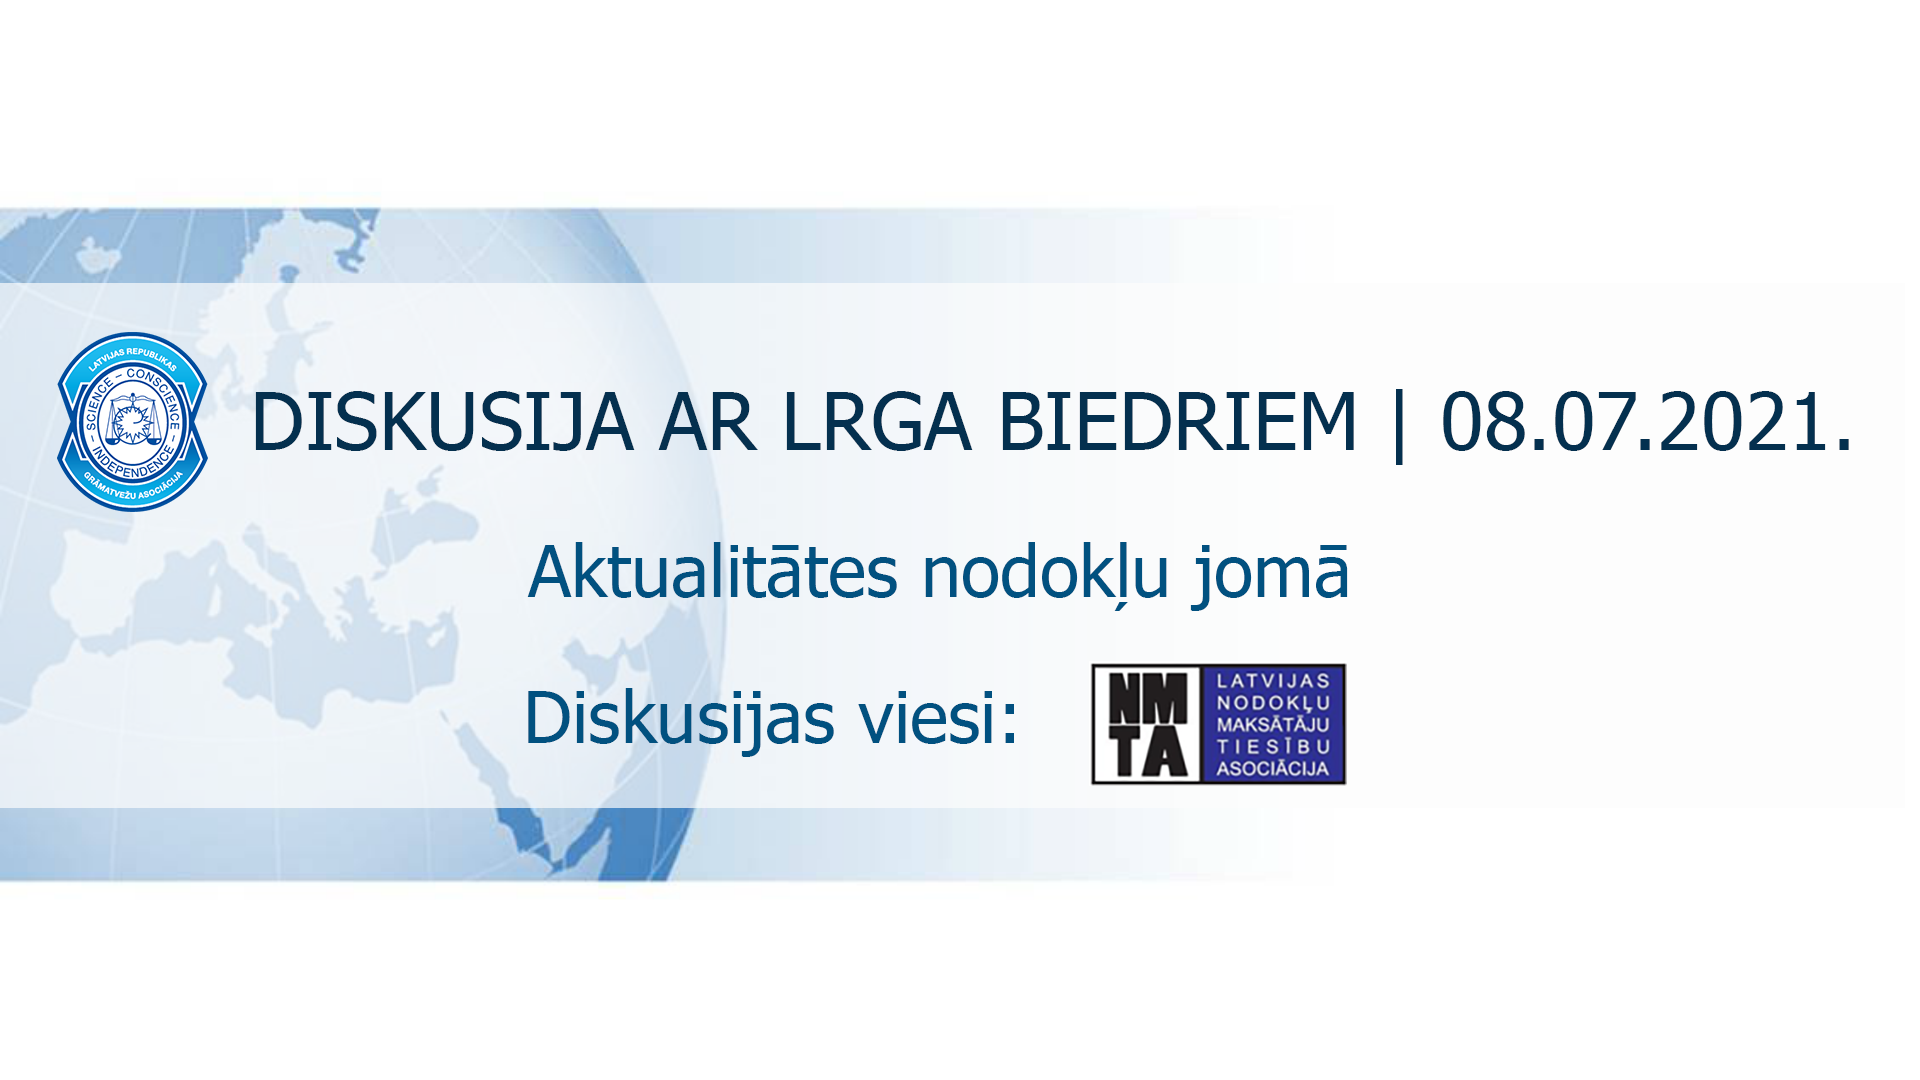 LRGA_diskusija_08.07.2021